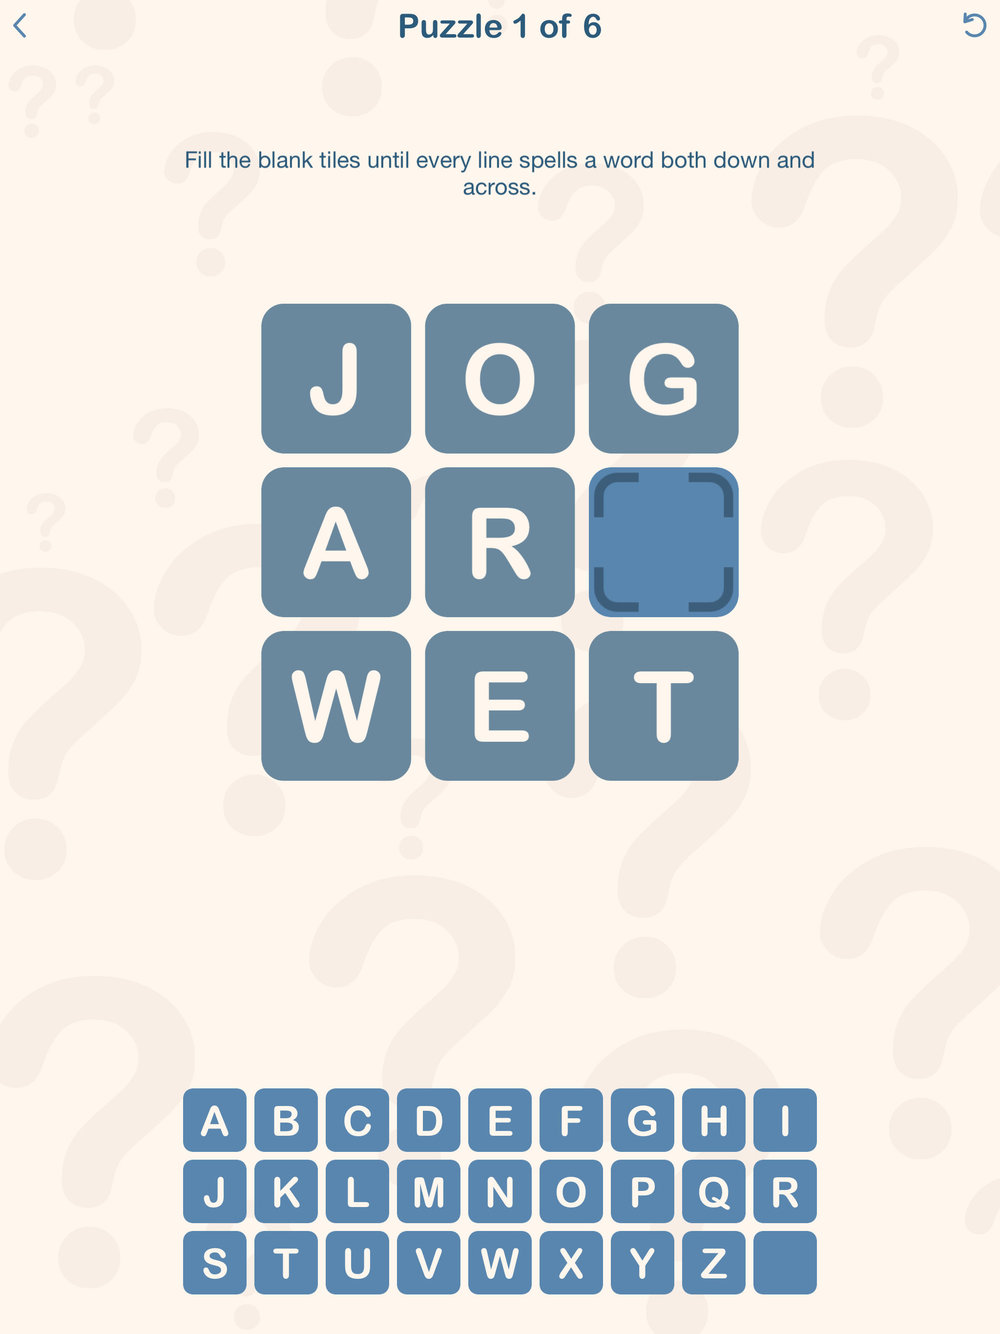 WW 1st puzzle ipad.jpg